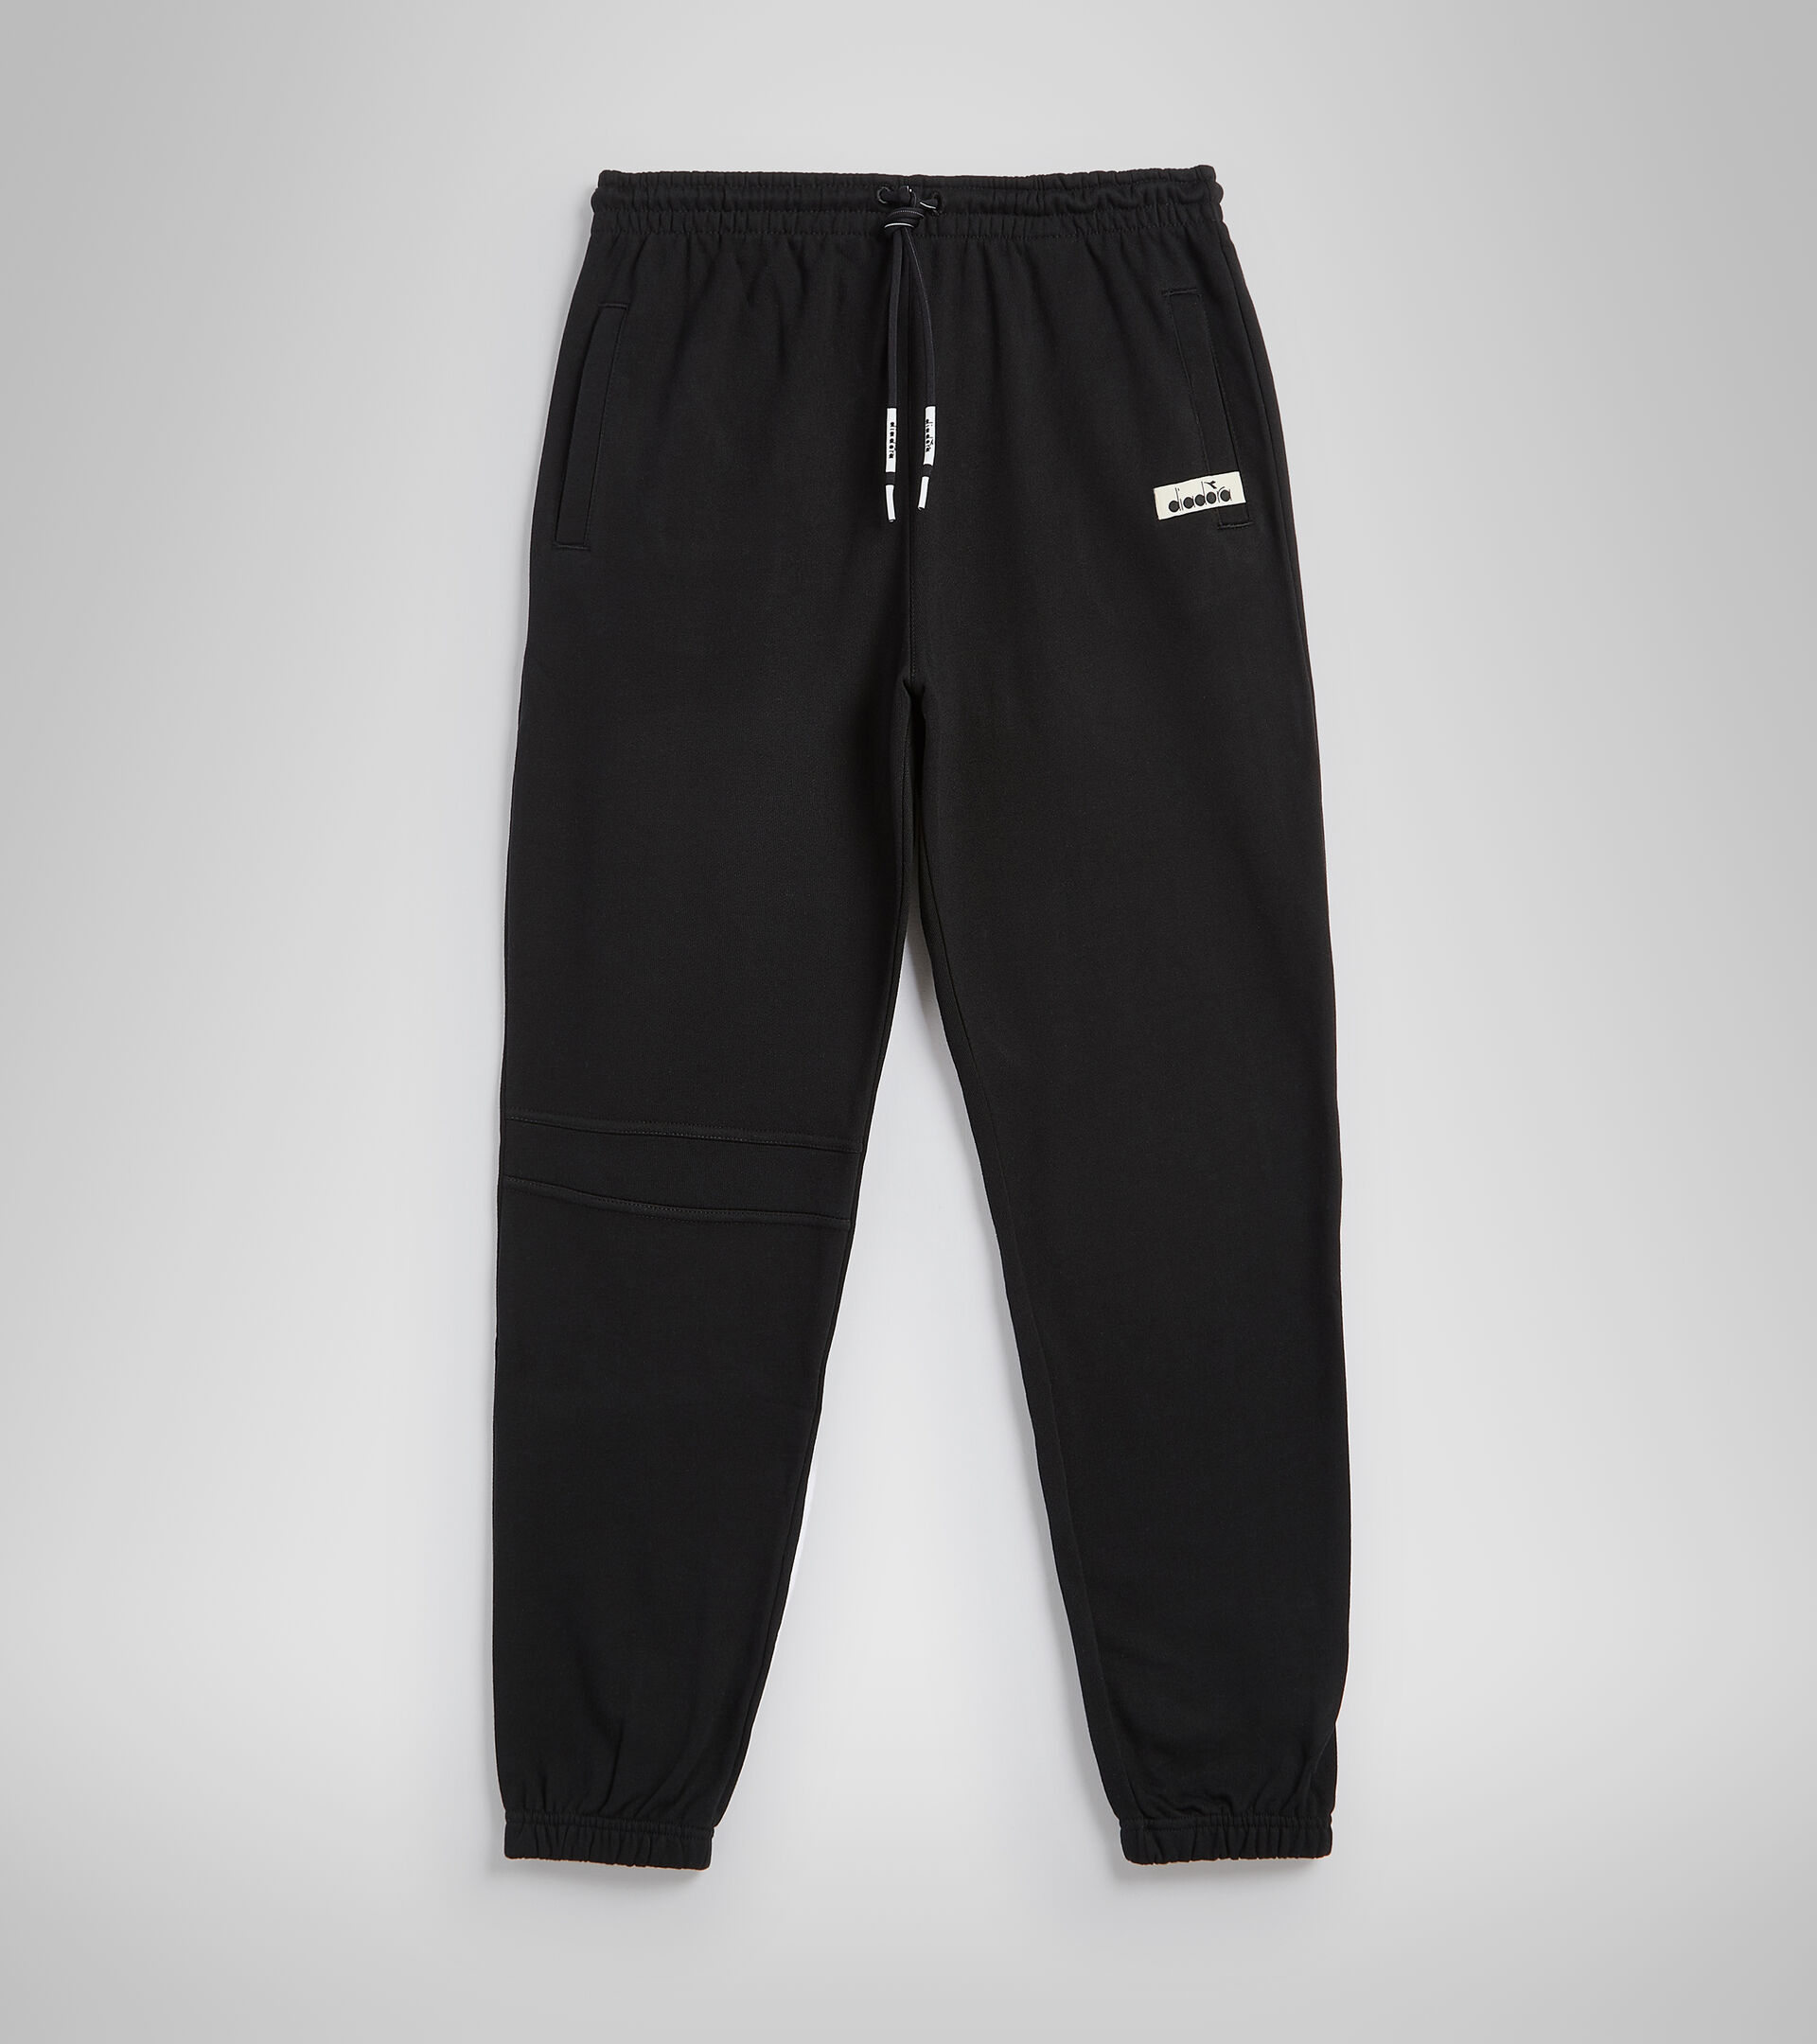 Sports trousers - Unisex PANT SQUADRA BLACK - Diadora